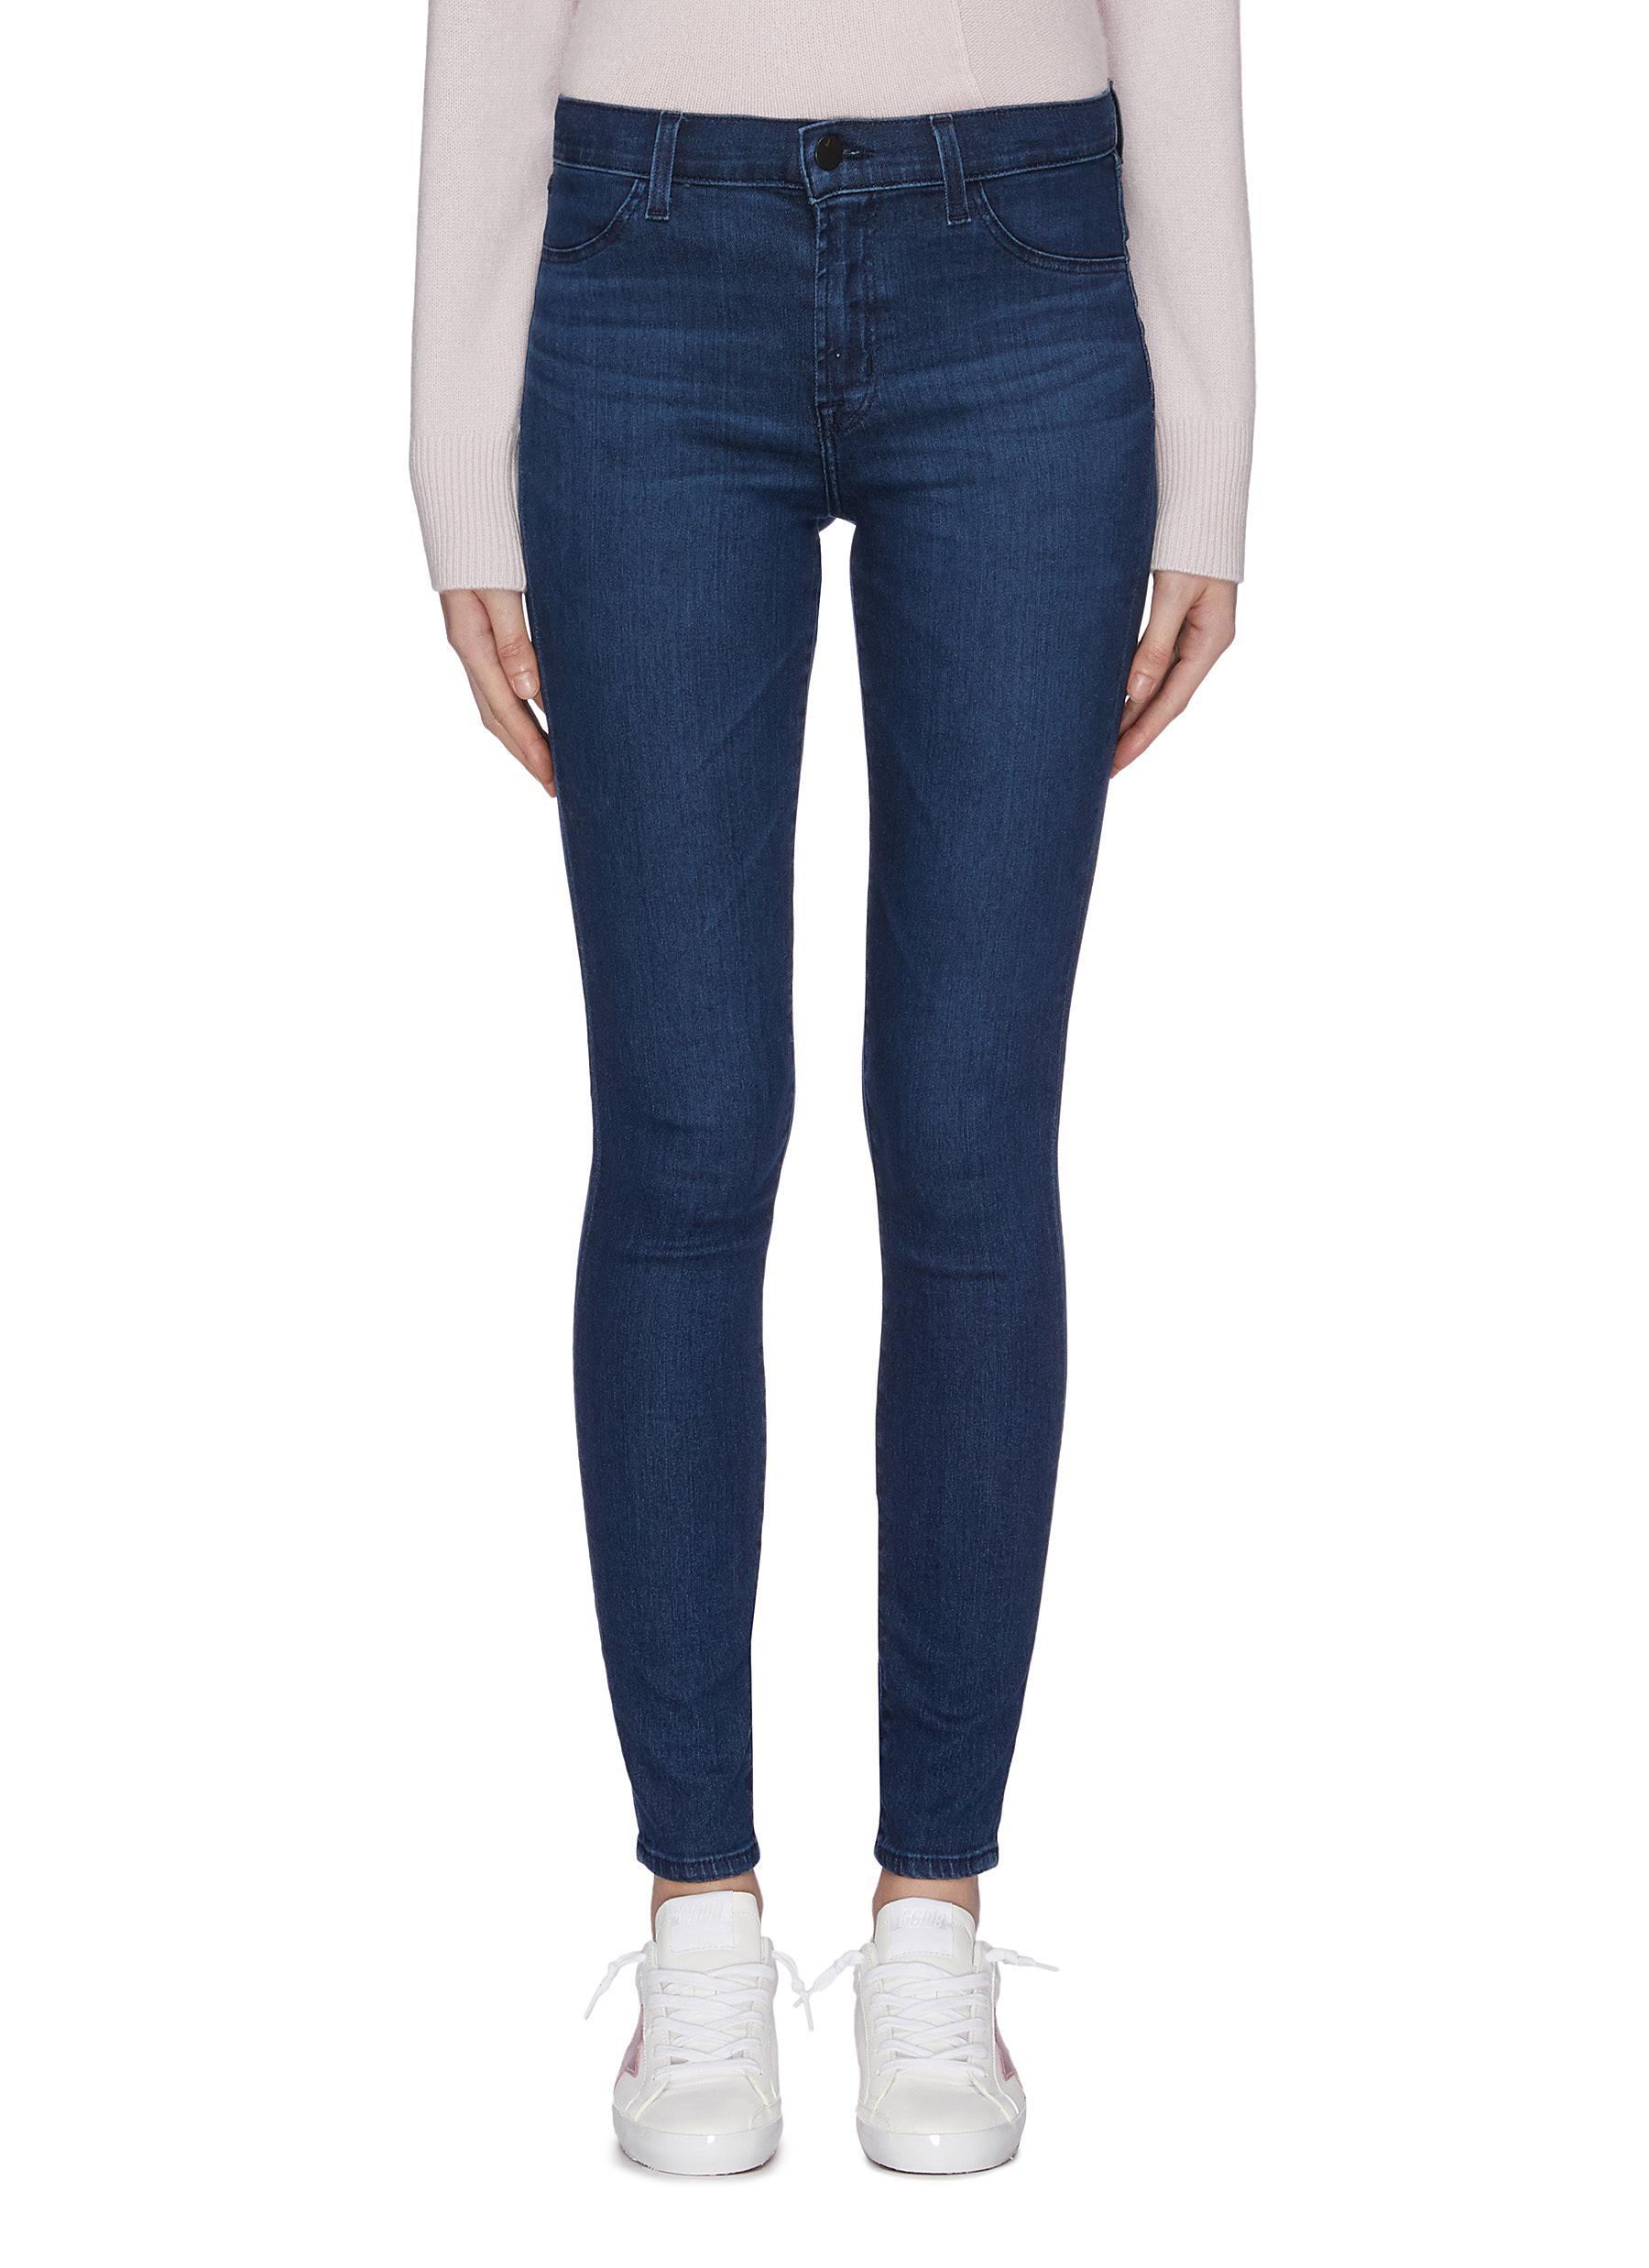 925 denim leggings by J Brand